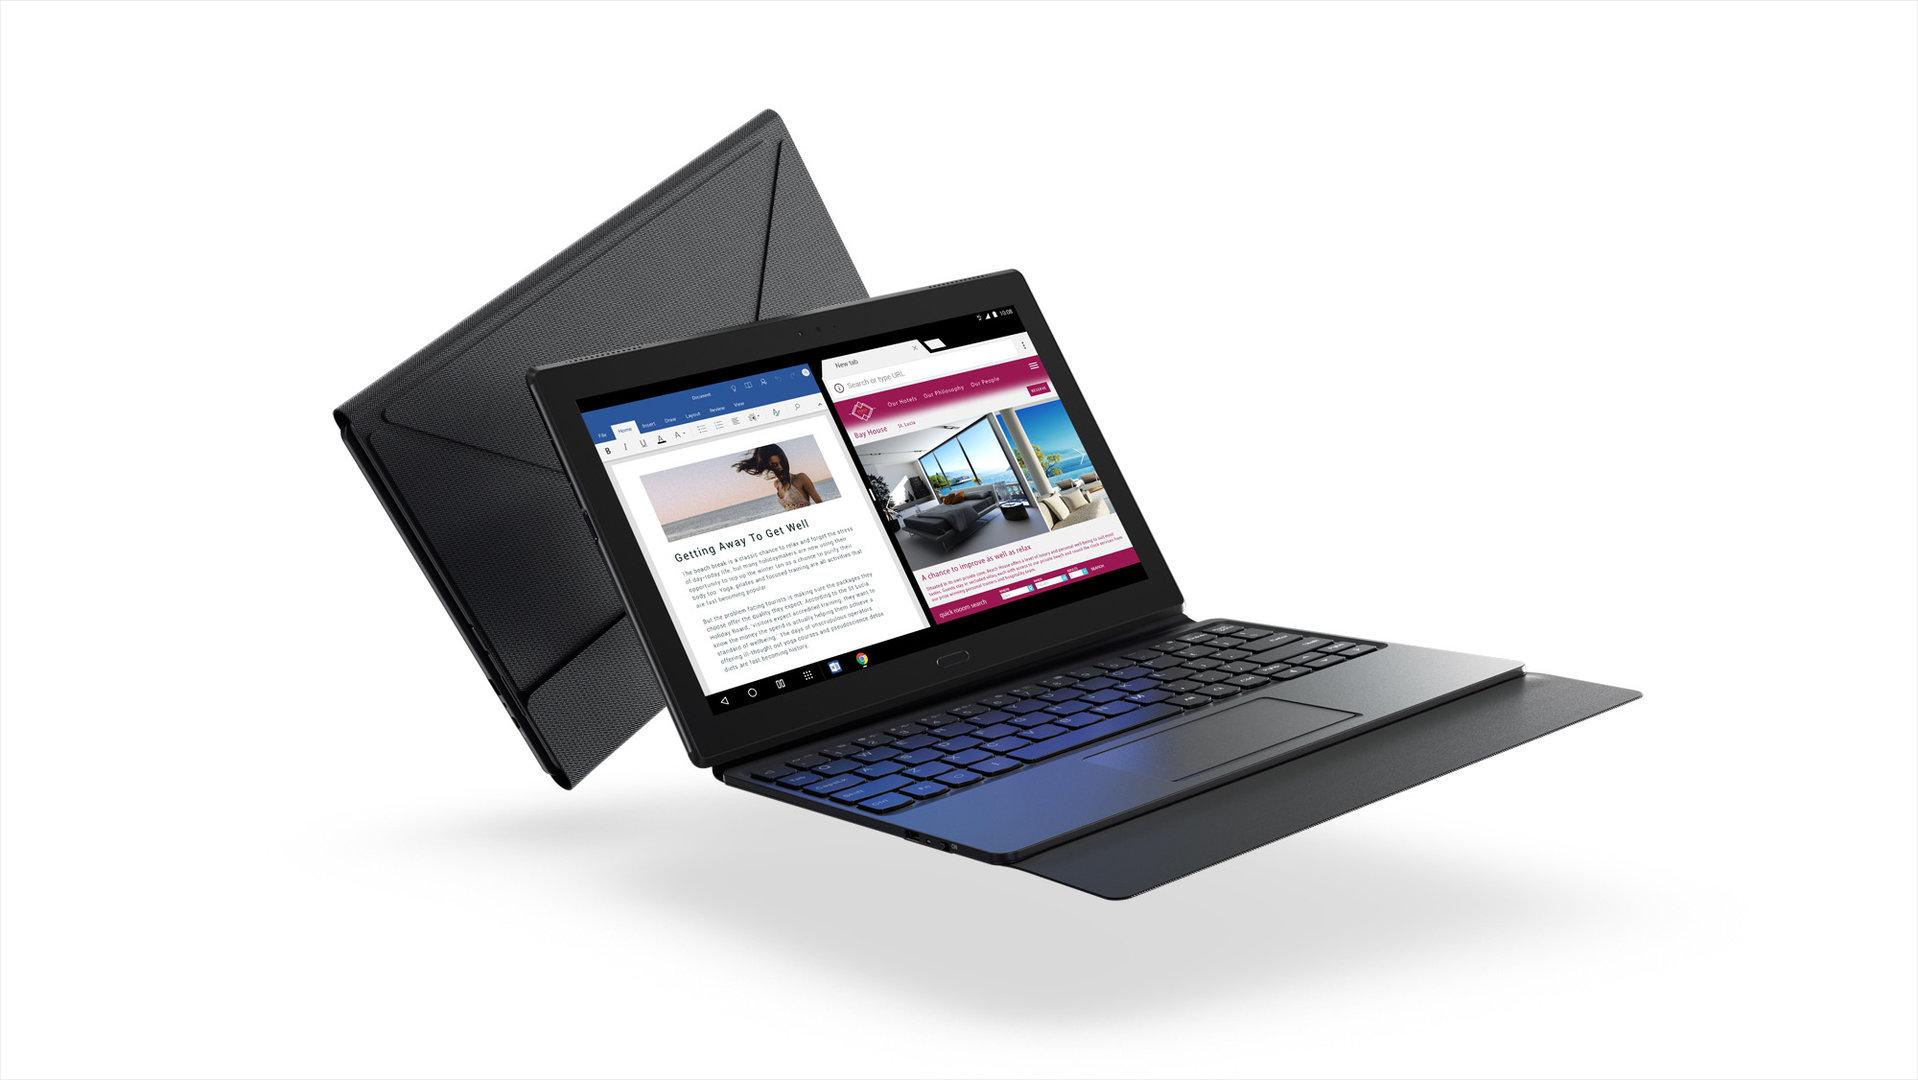 Lenovo Tab 4 10 Plus mit Productivity Pack